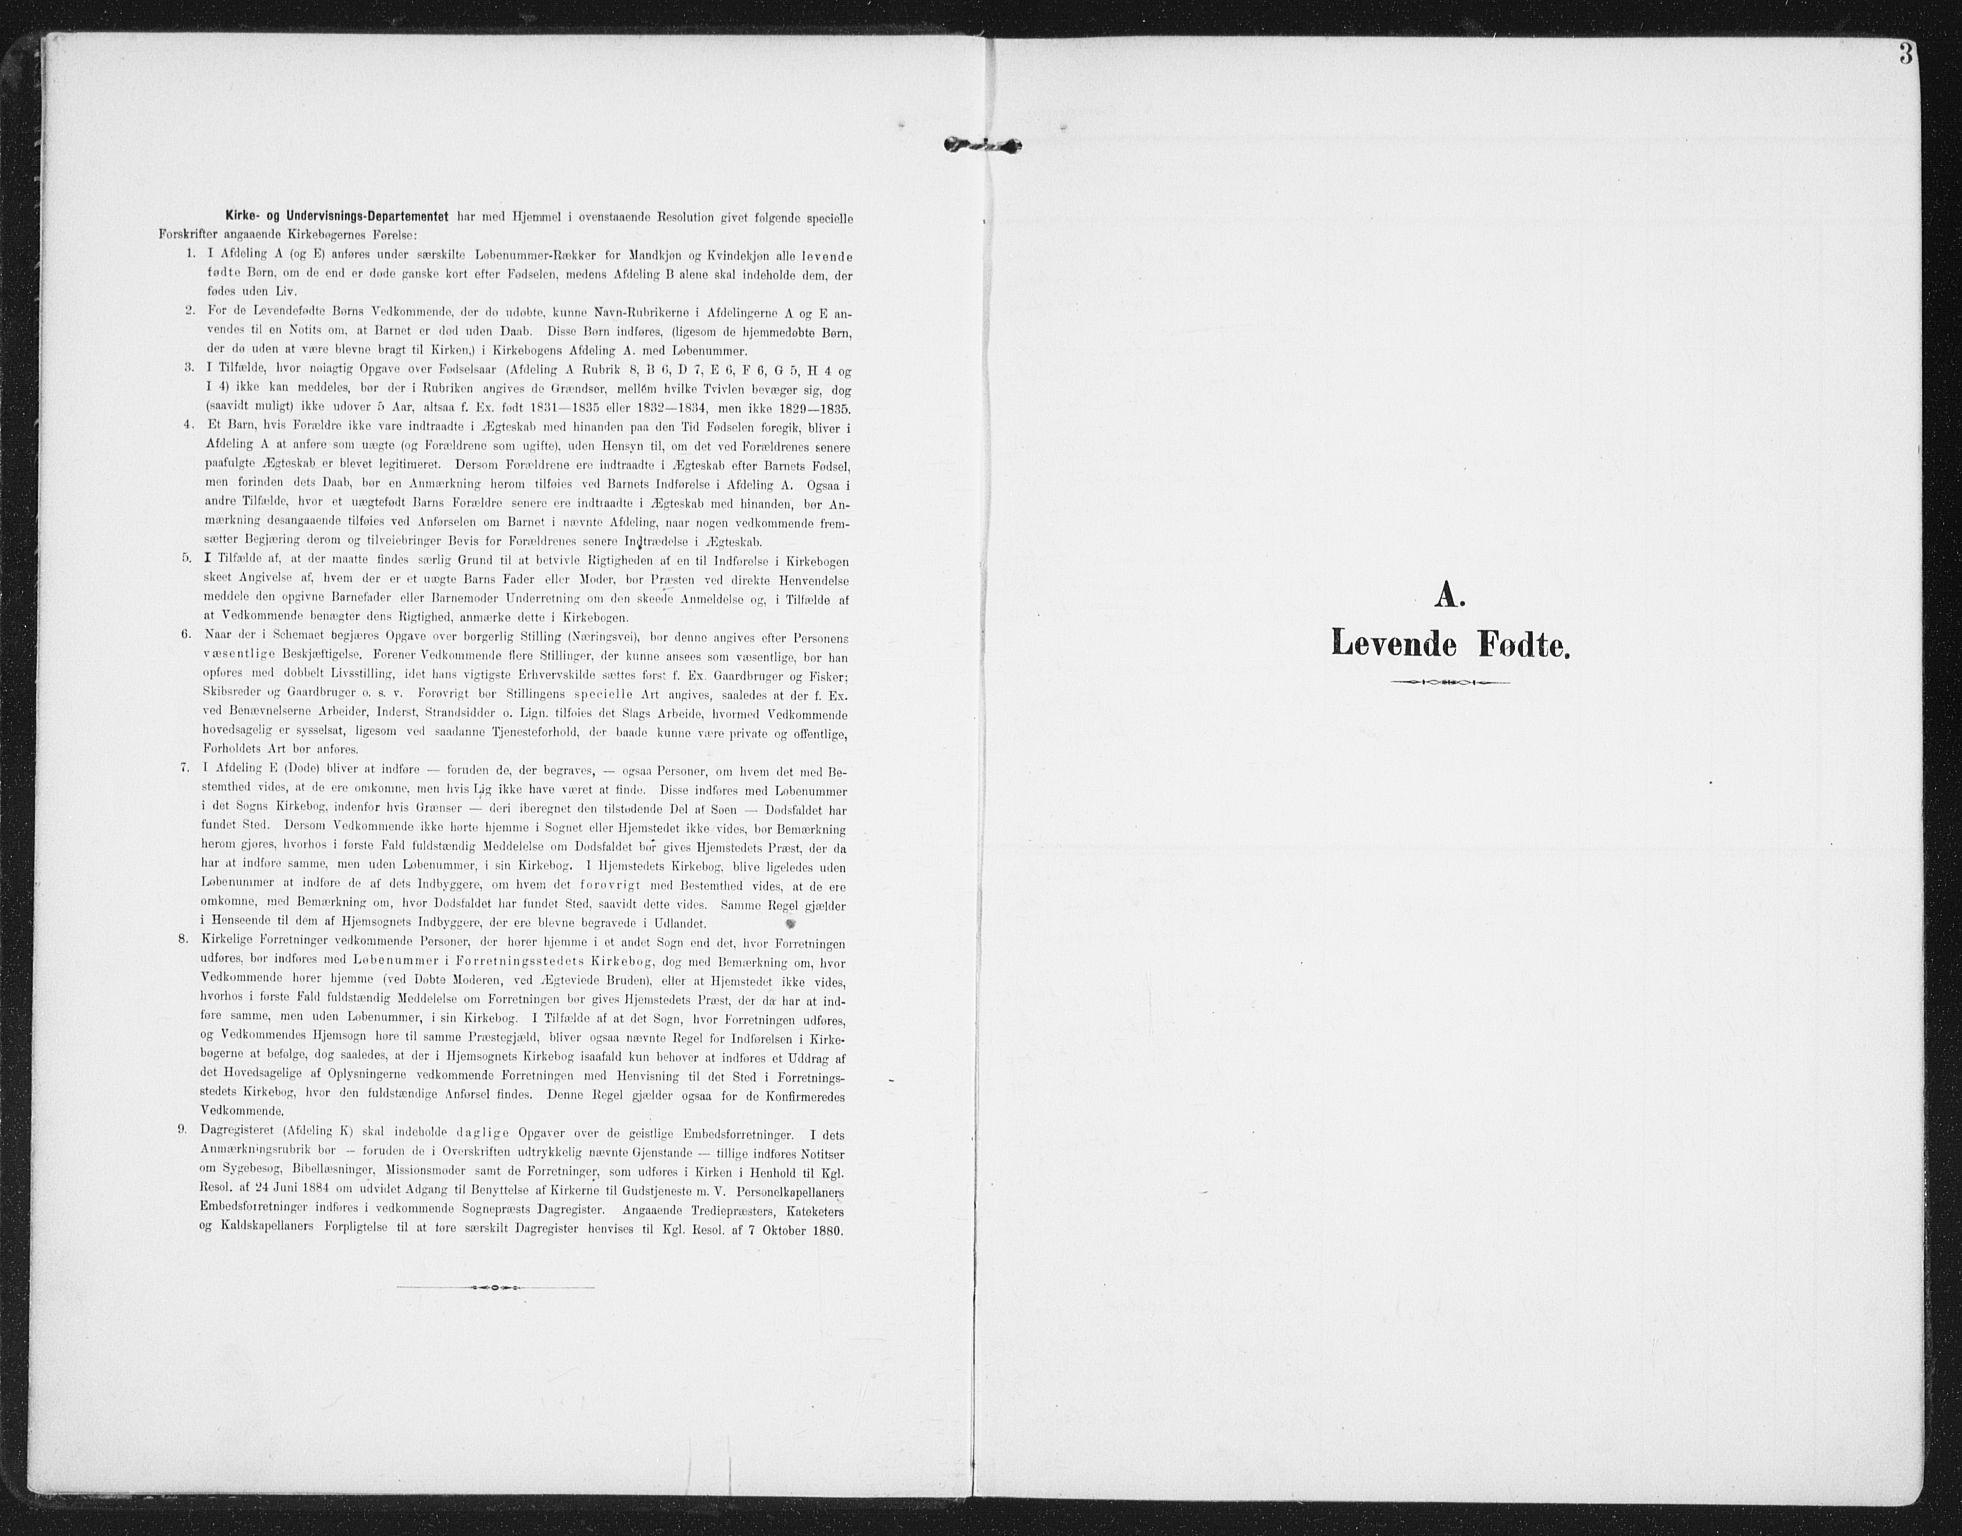 SAT, Ministerialprotokoller, klokkerbøker og fødselsregistre - Nordland, 886/L1221: Ministerialbok nr. 886A03, 1903-1913, s. 3